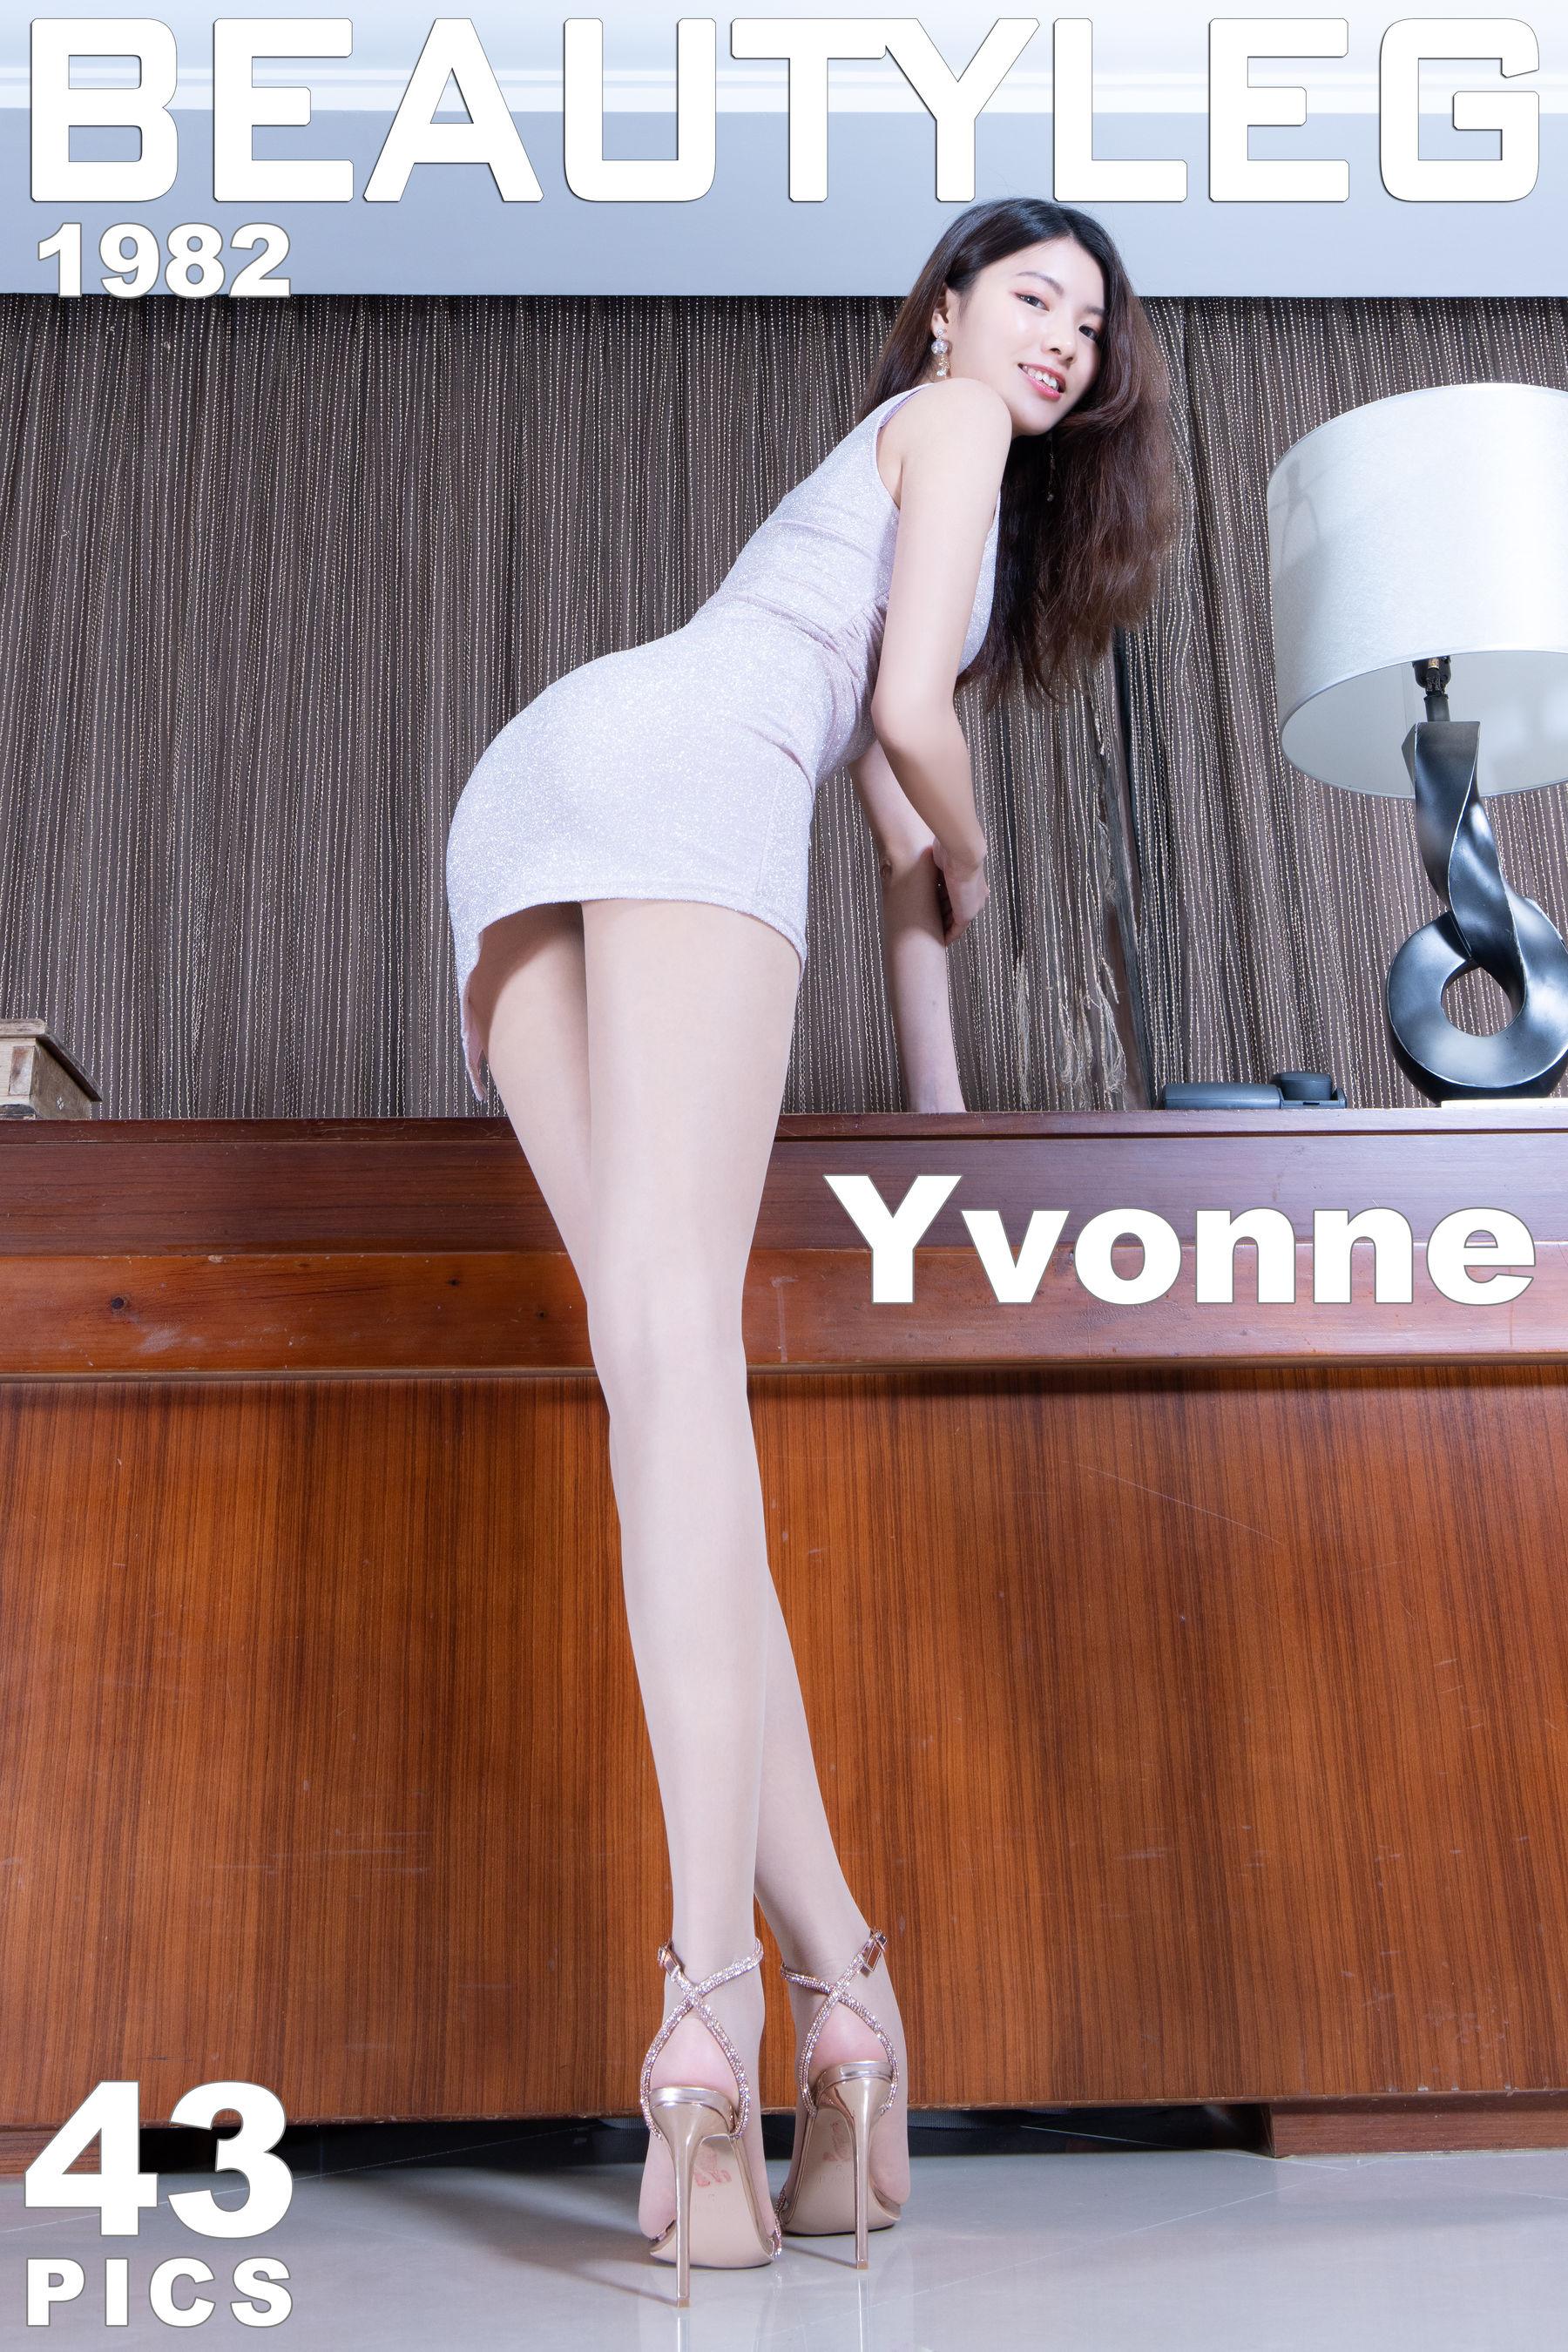 VOL.1768 [Beautyleg]肉丝美腿:梁以辰(钟幸村)超高清个人性感漂亮大图(43P)